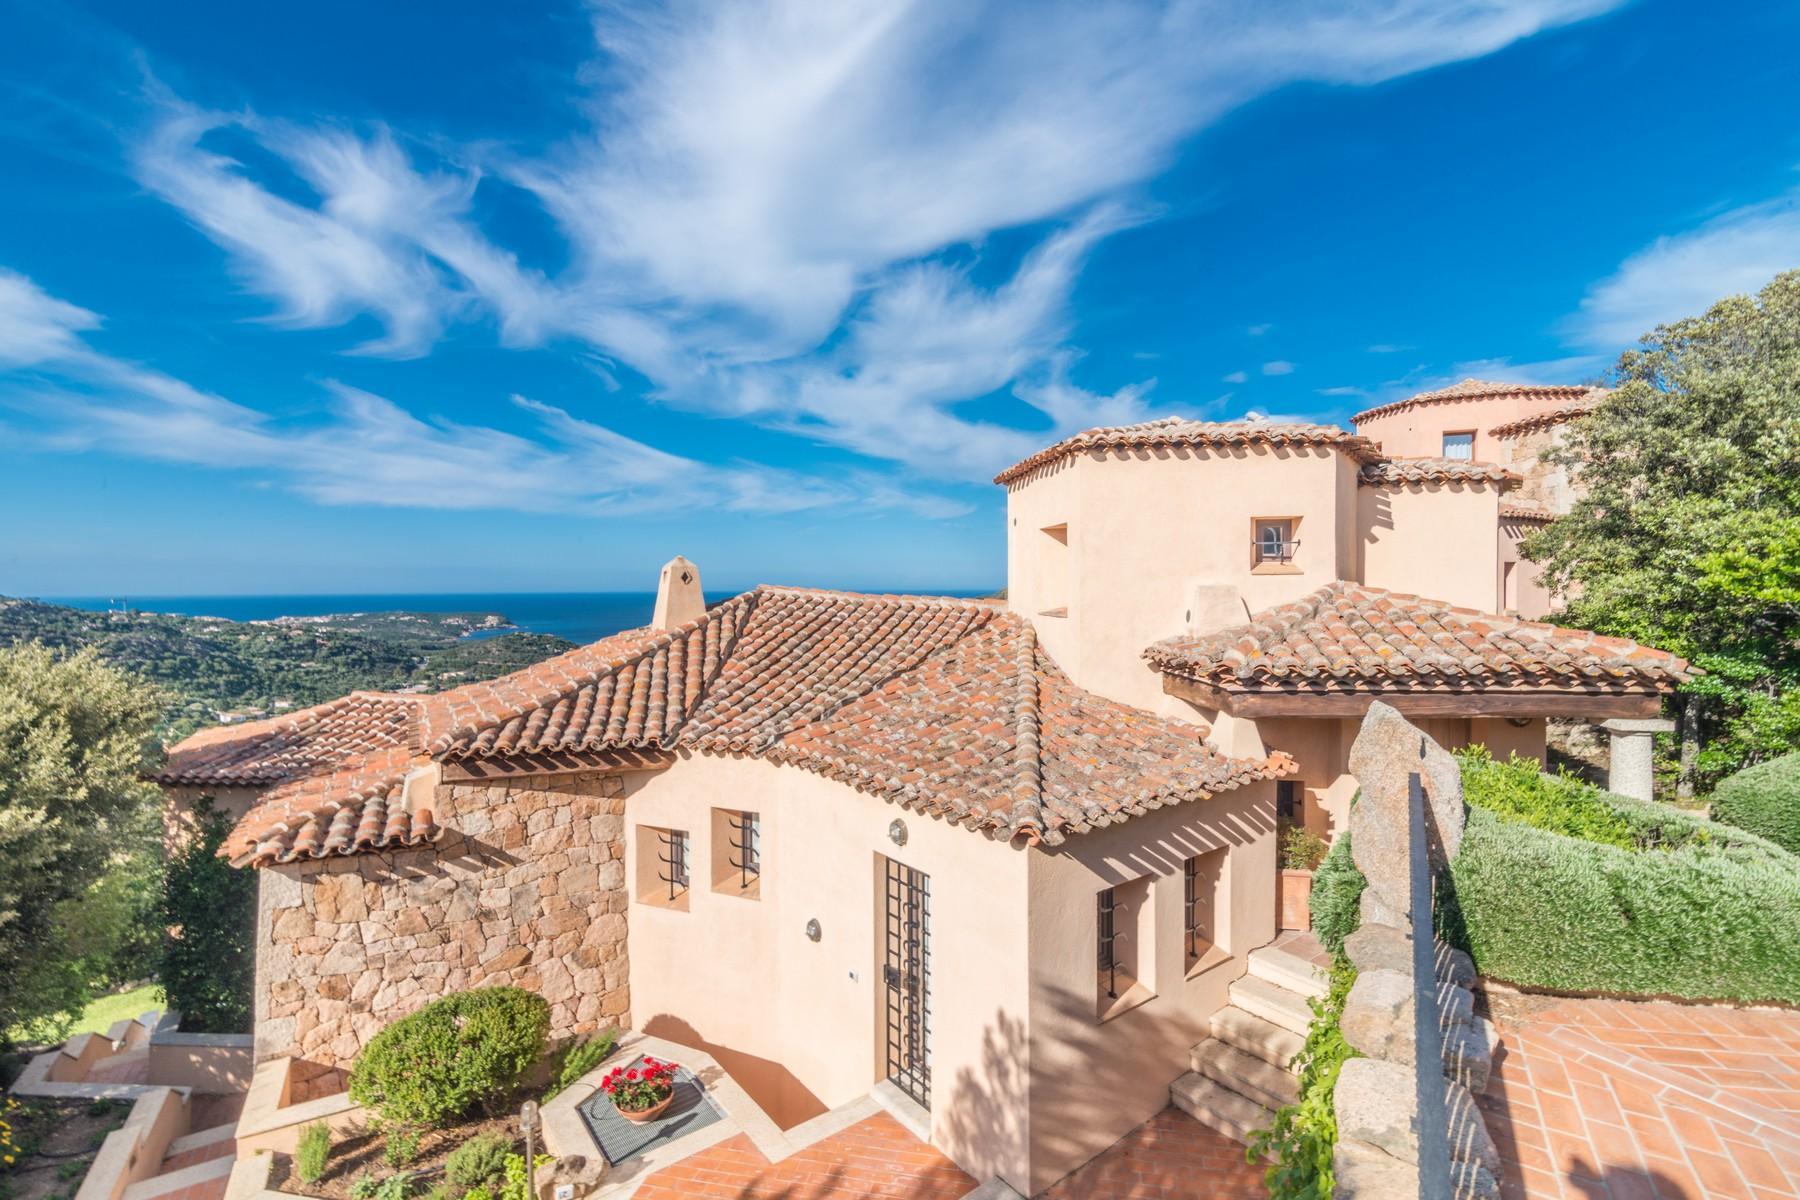 Abbiadori Отличный таунхаус с видом на море на холмах Сардинии, Италия - 36